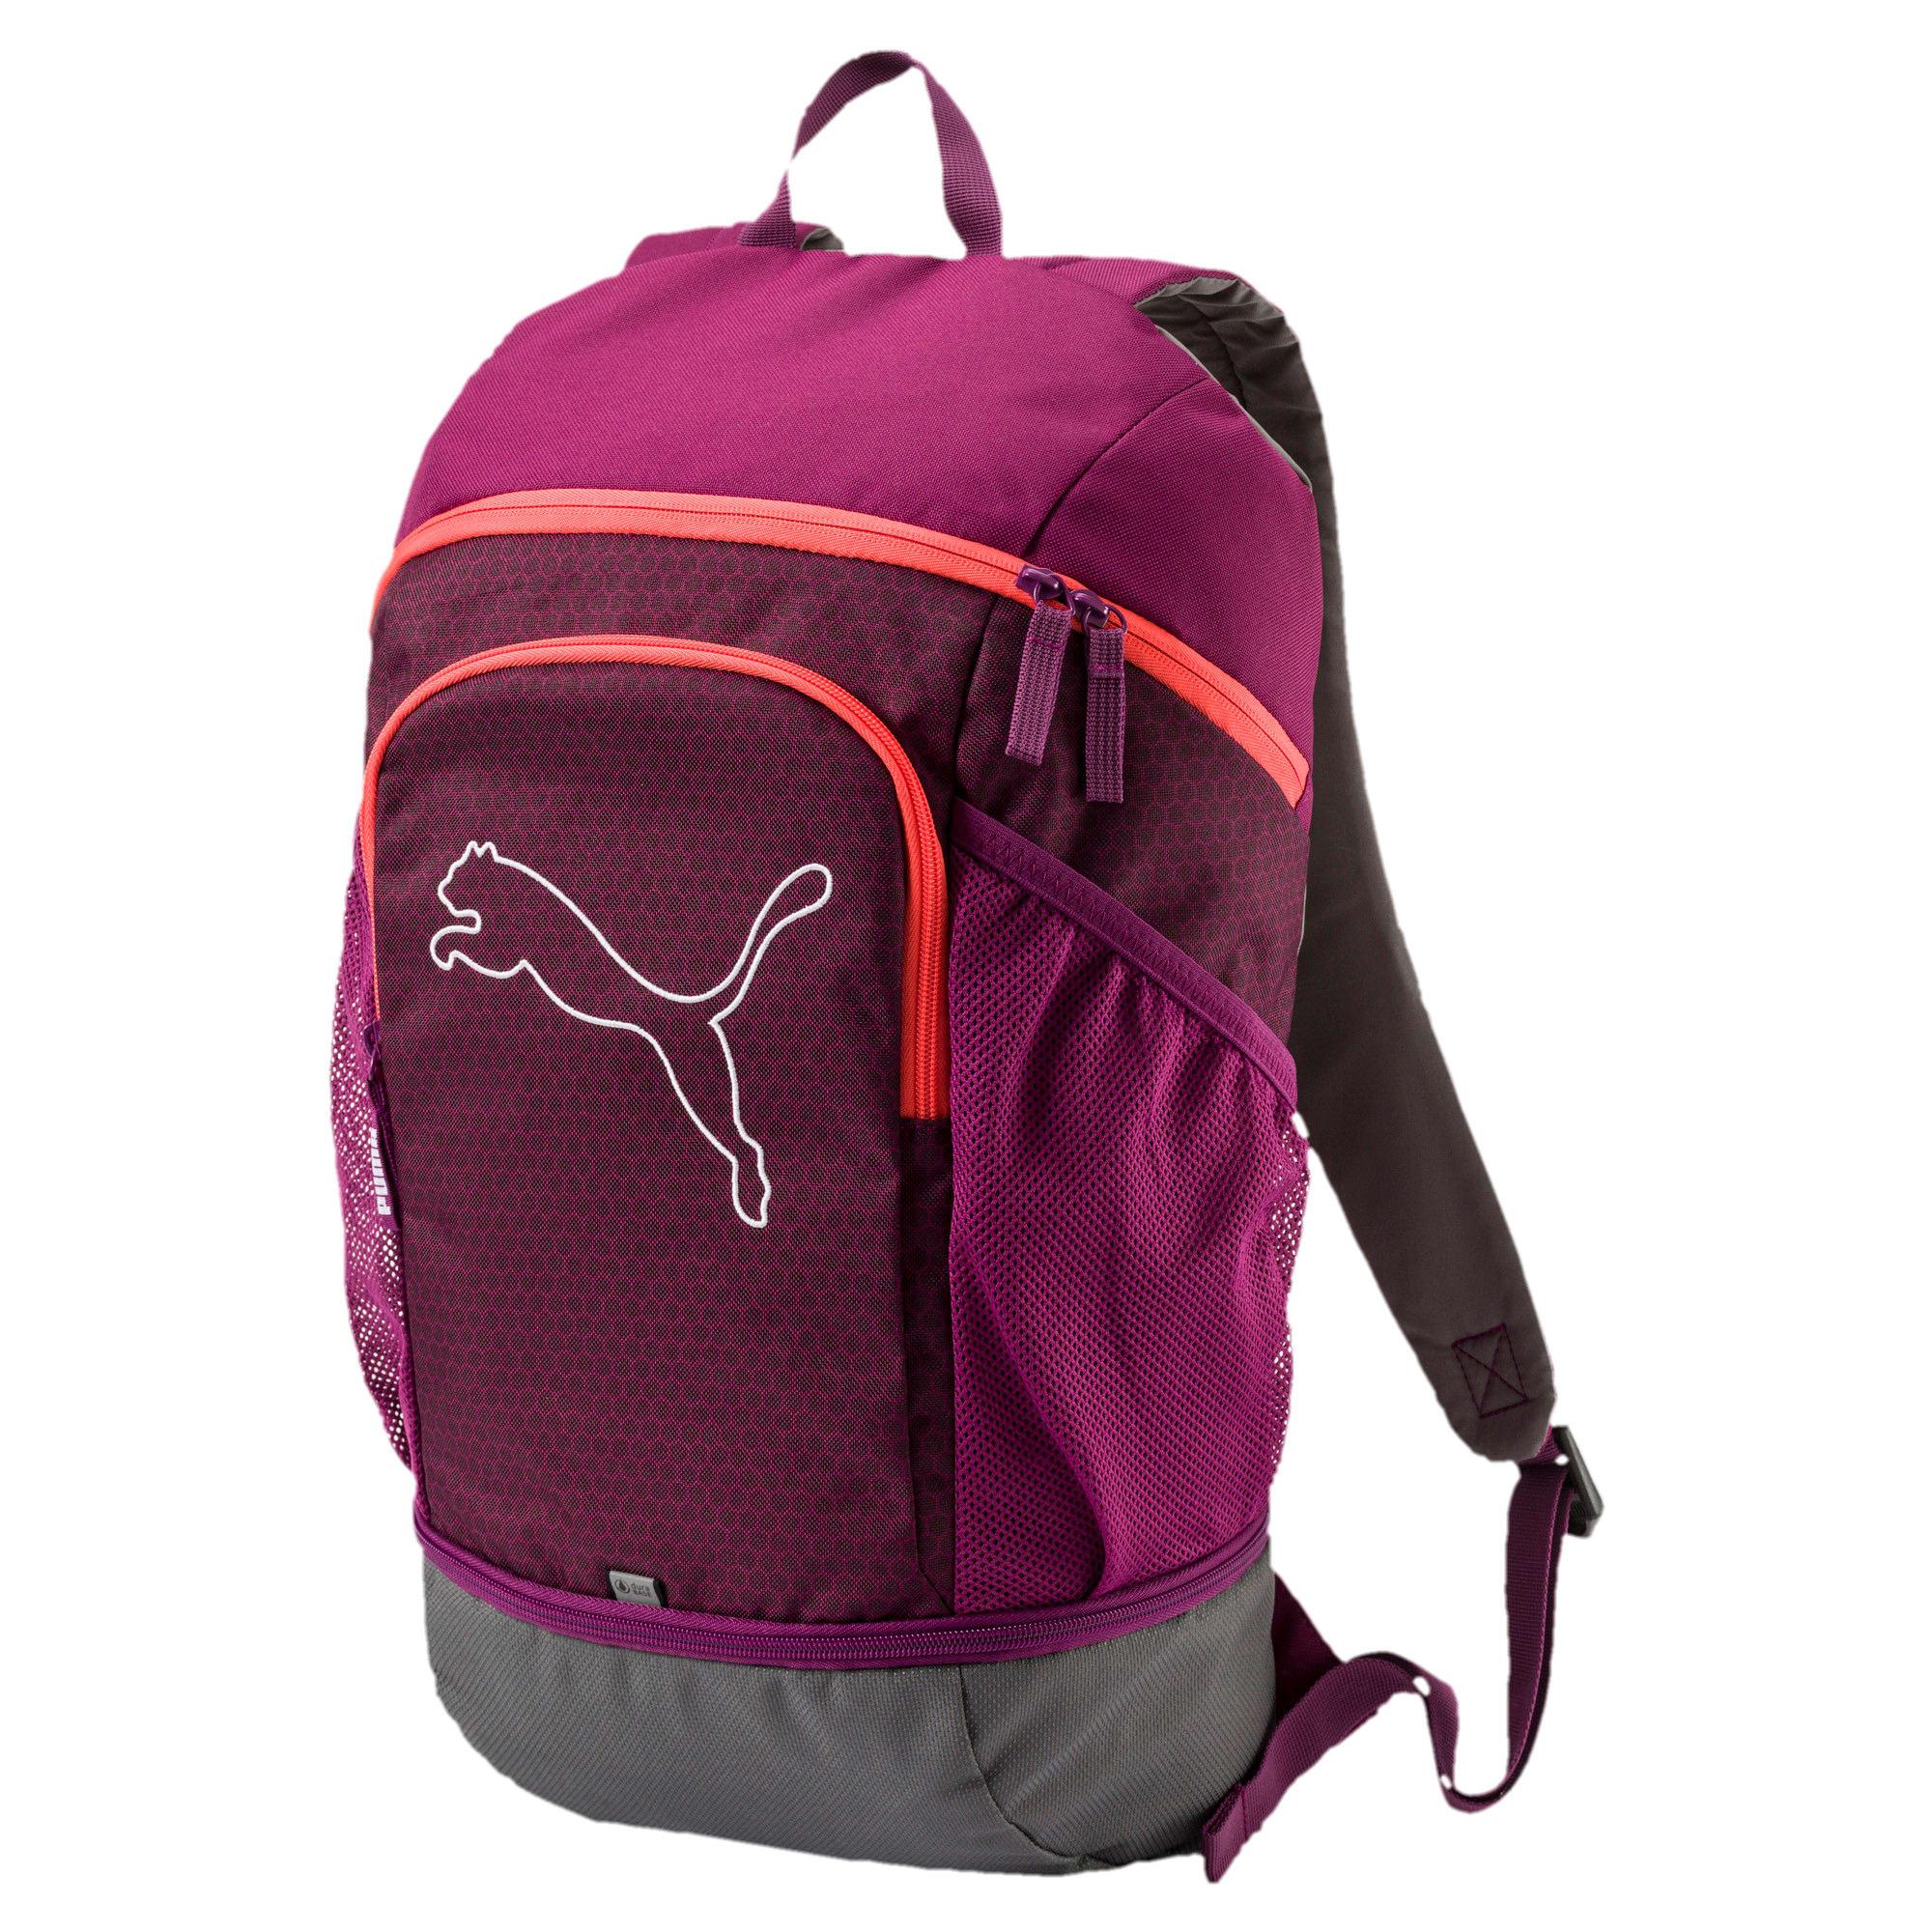 Thumbnail 1 of Echo Backpack, Dark Purple-Hot Coral, medium-IND